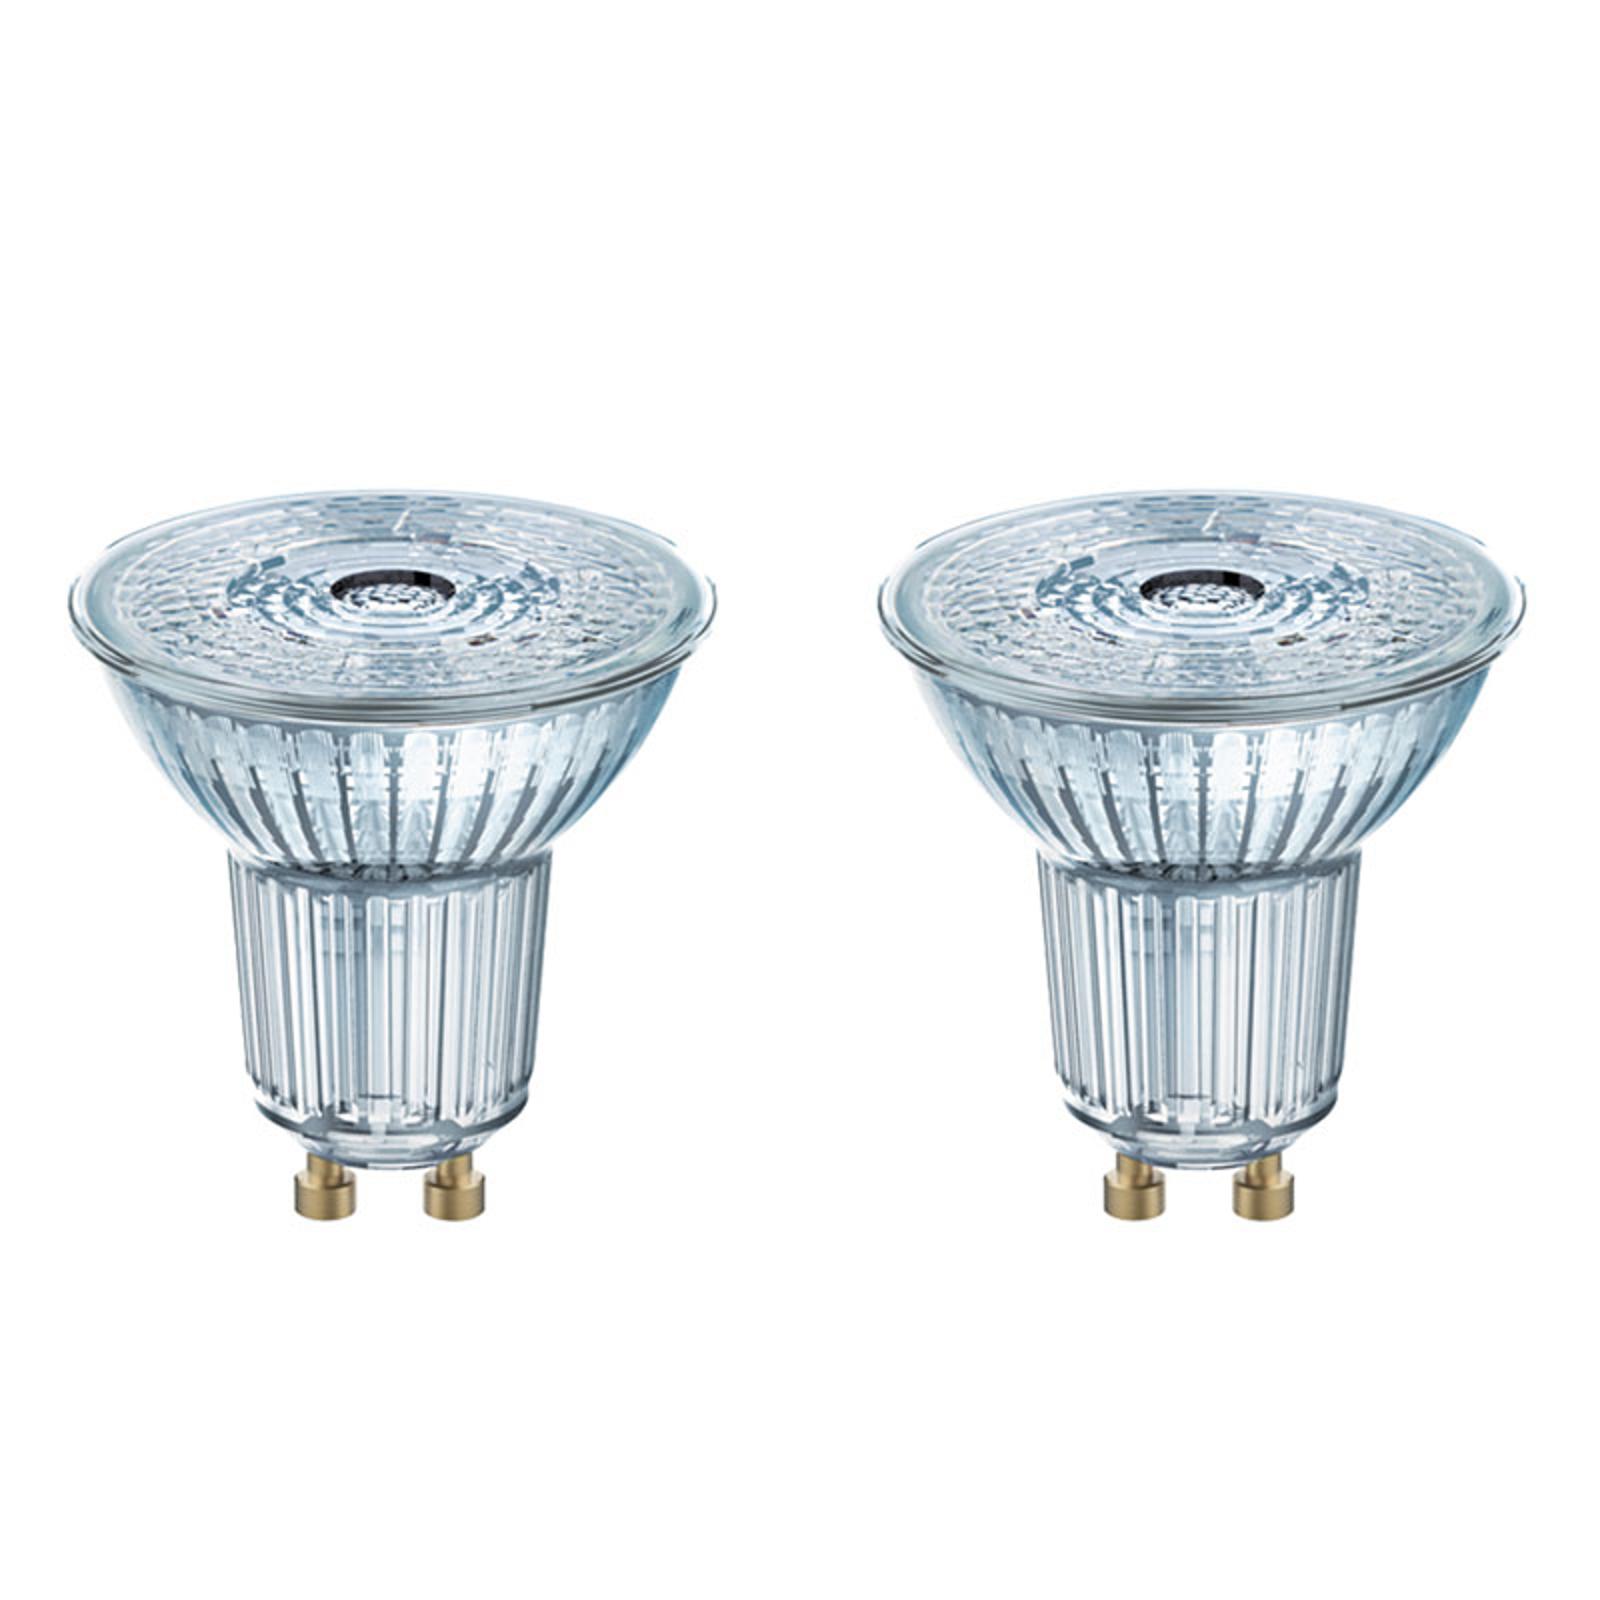 GU10 4,3W 827 LED reflektor 2'er sæt